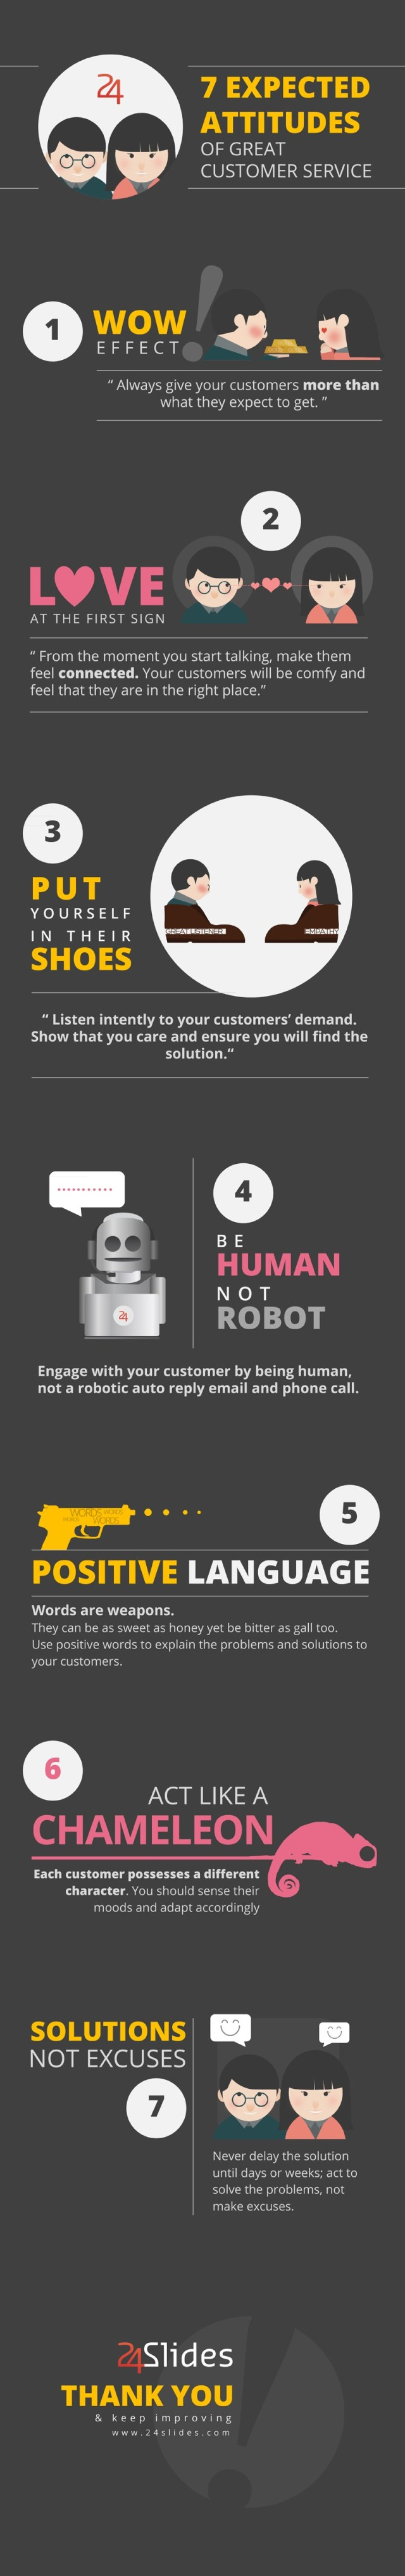 Customer Service info